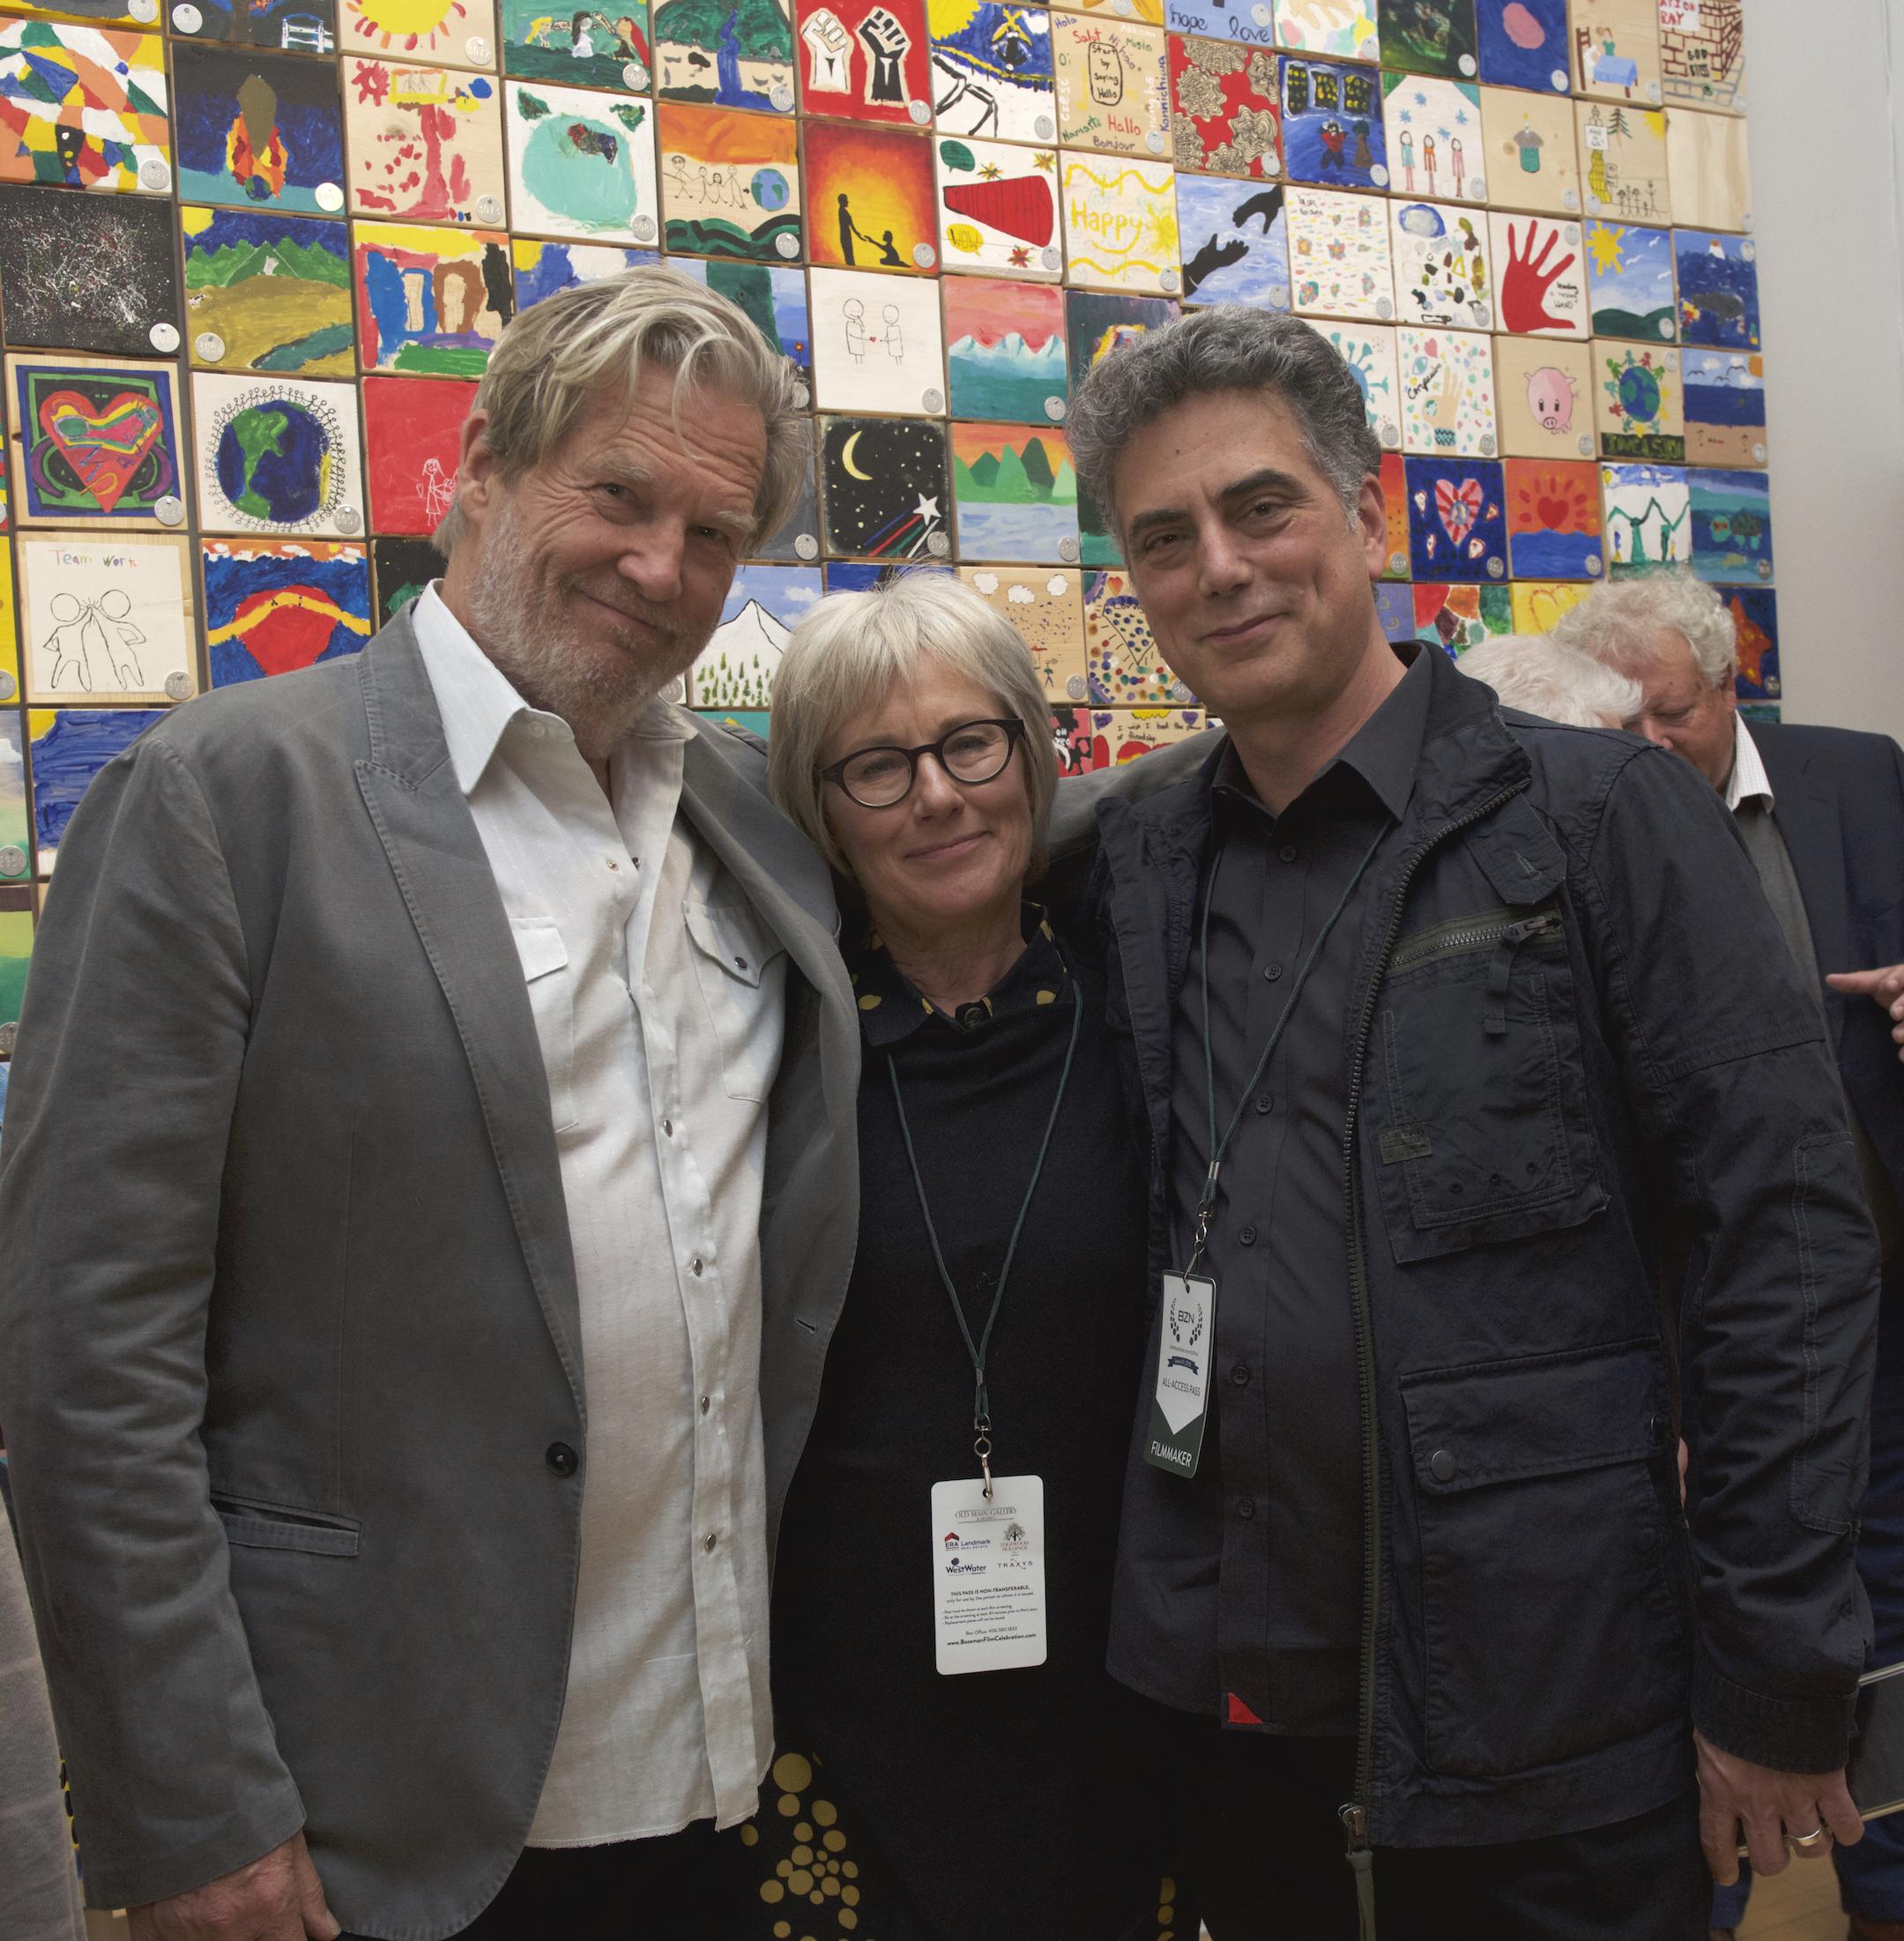 Oscar winner Jeff Bridges (featured in film) Director Barbara Bentree and Producer John Rangel before Q&A Panel with Dave Grusin at the Bozeman International Film Festival